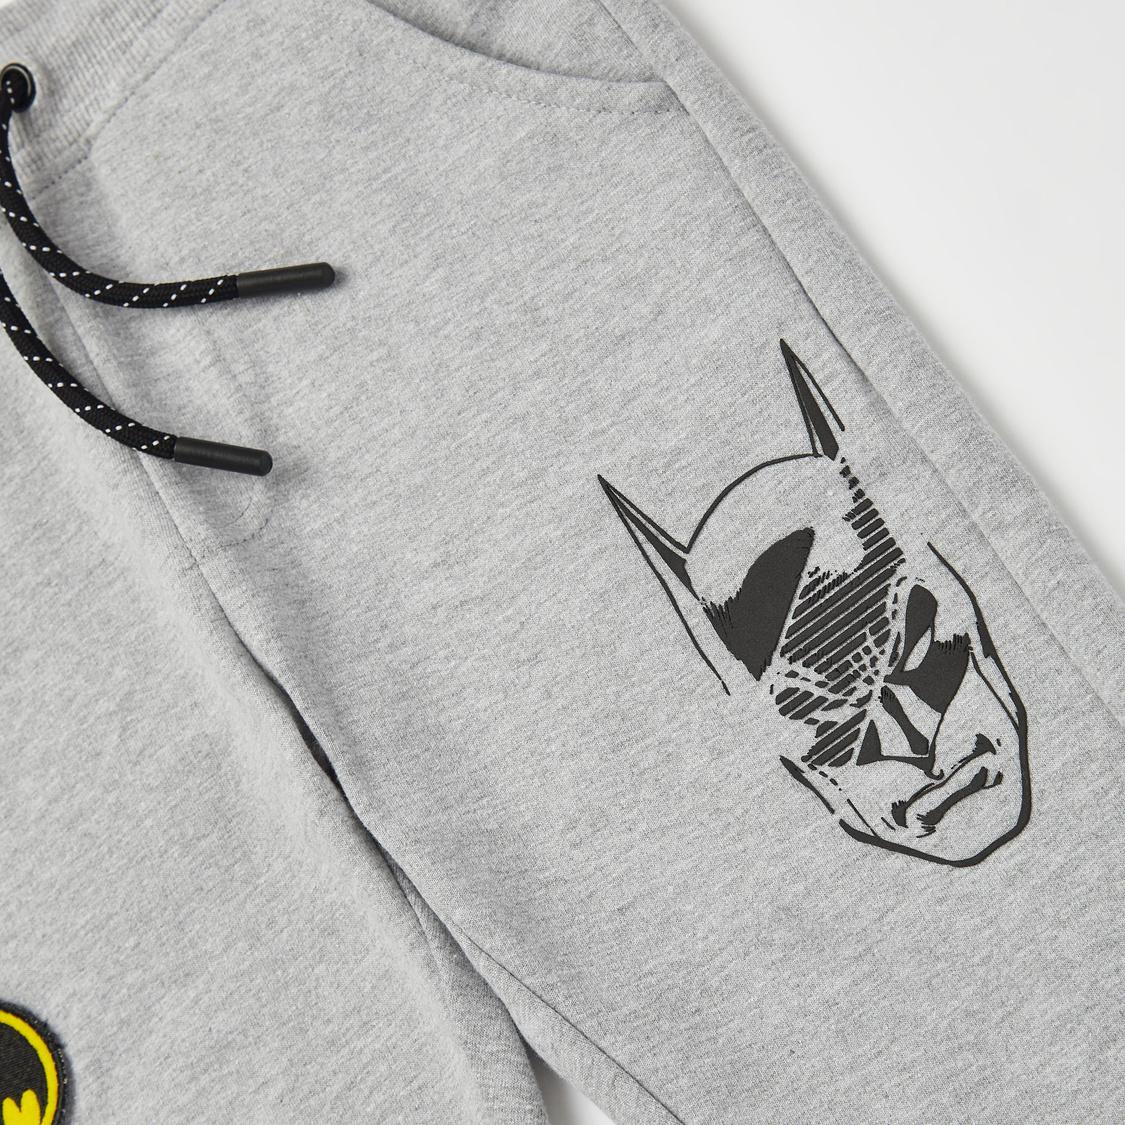 Batman Slogan Hoodie with Printed Full Length Jog Pants